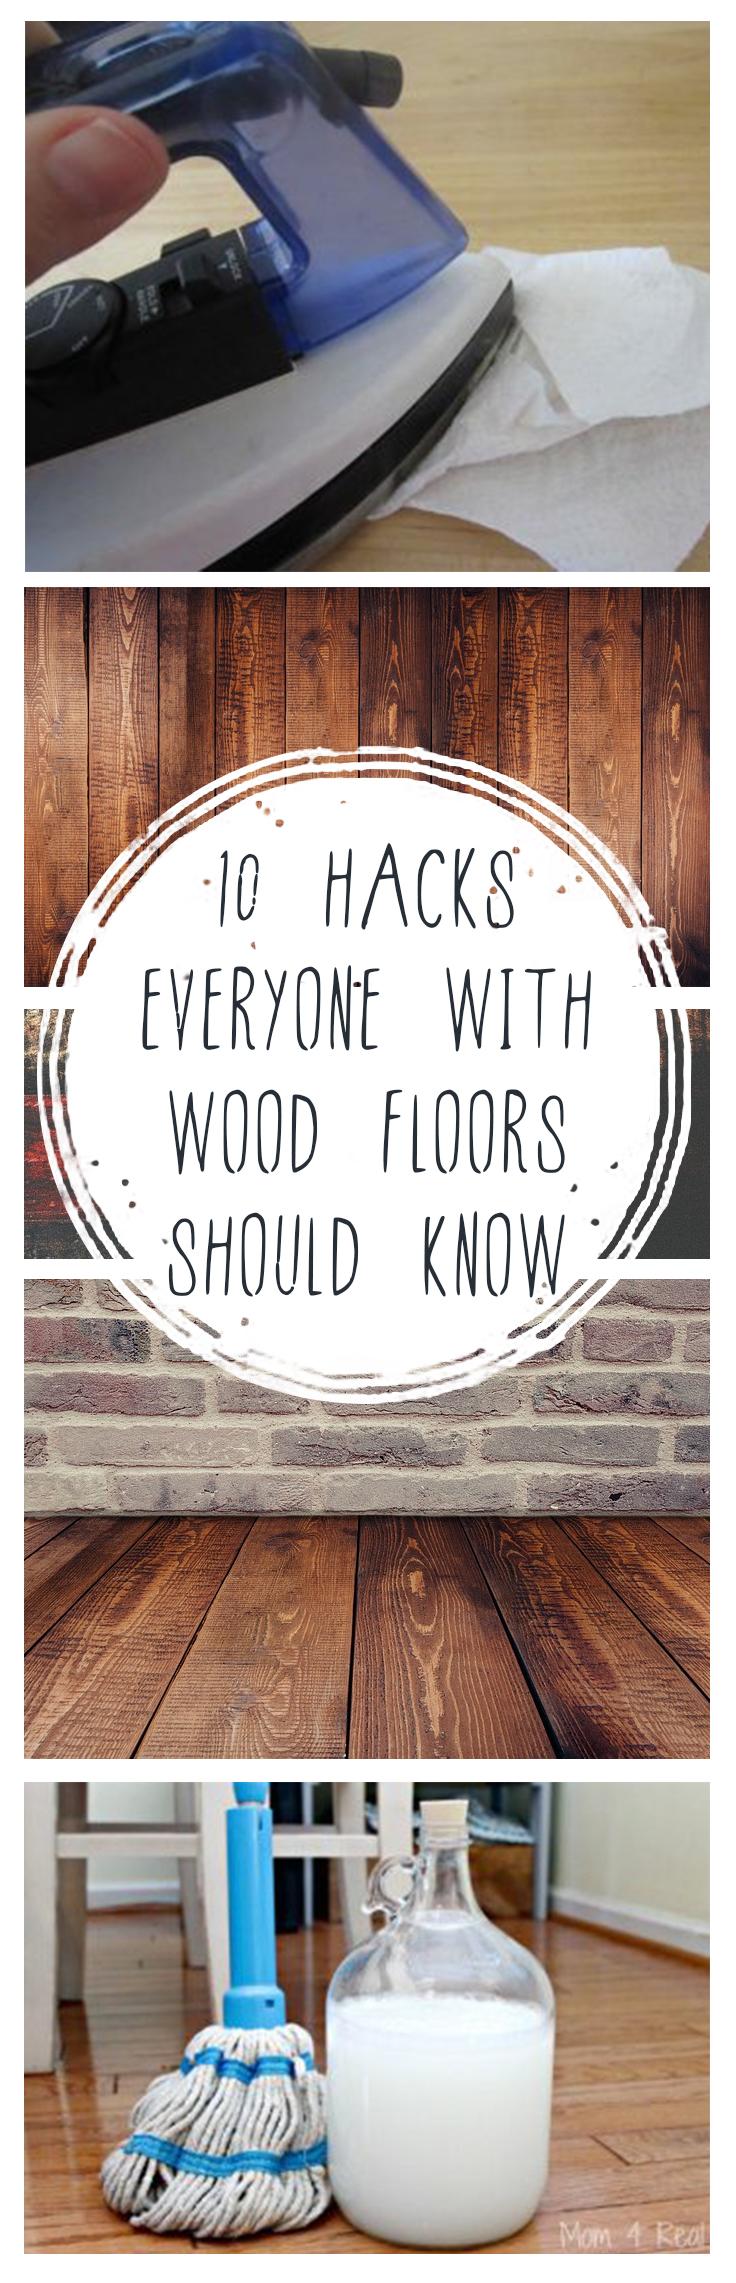 Wood Floor Hacks You Should Know- Make Life Easier with these Wood Floor Hacks